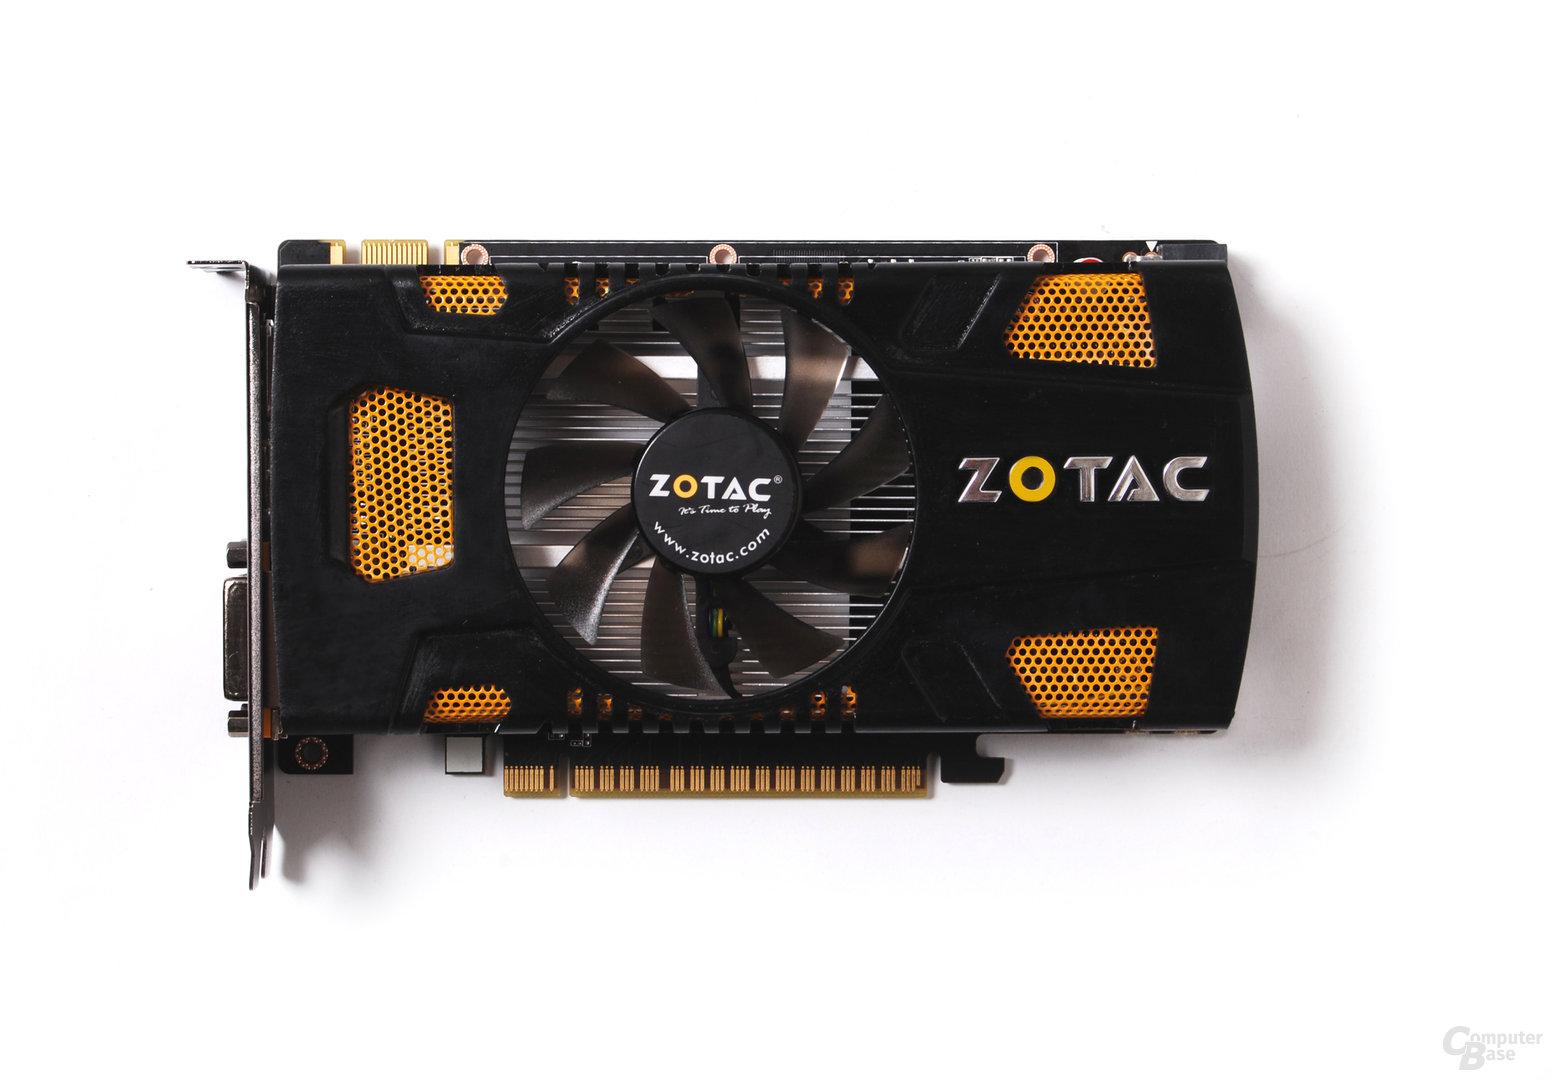 Zotac GTX 550 Ti AMP! Edition